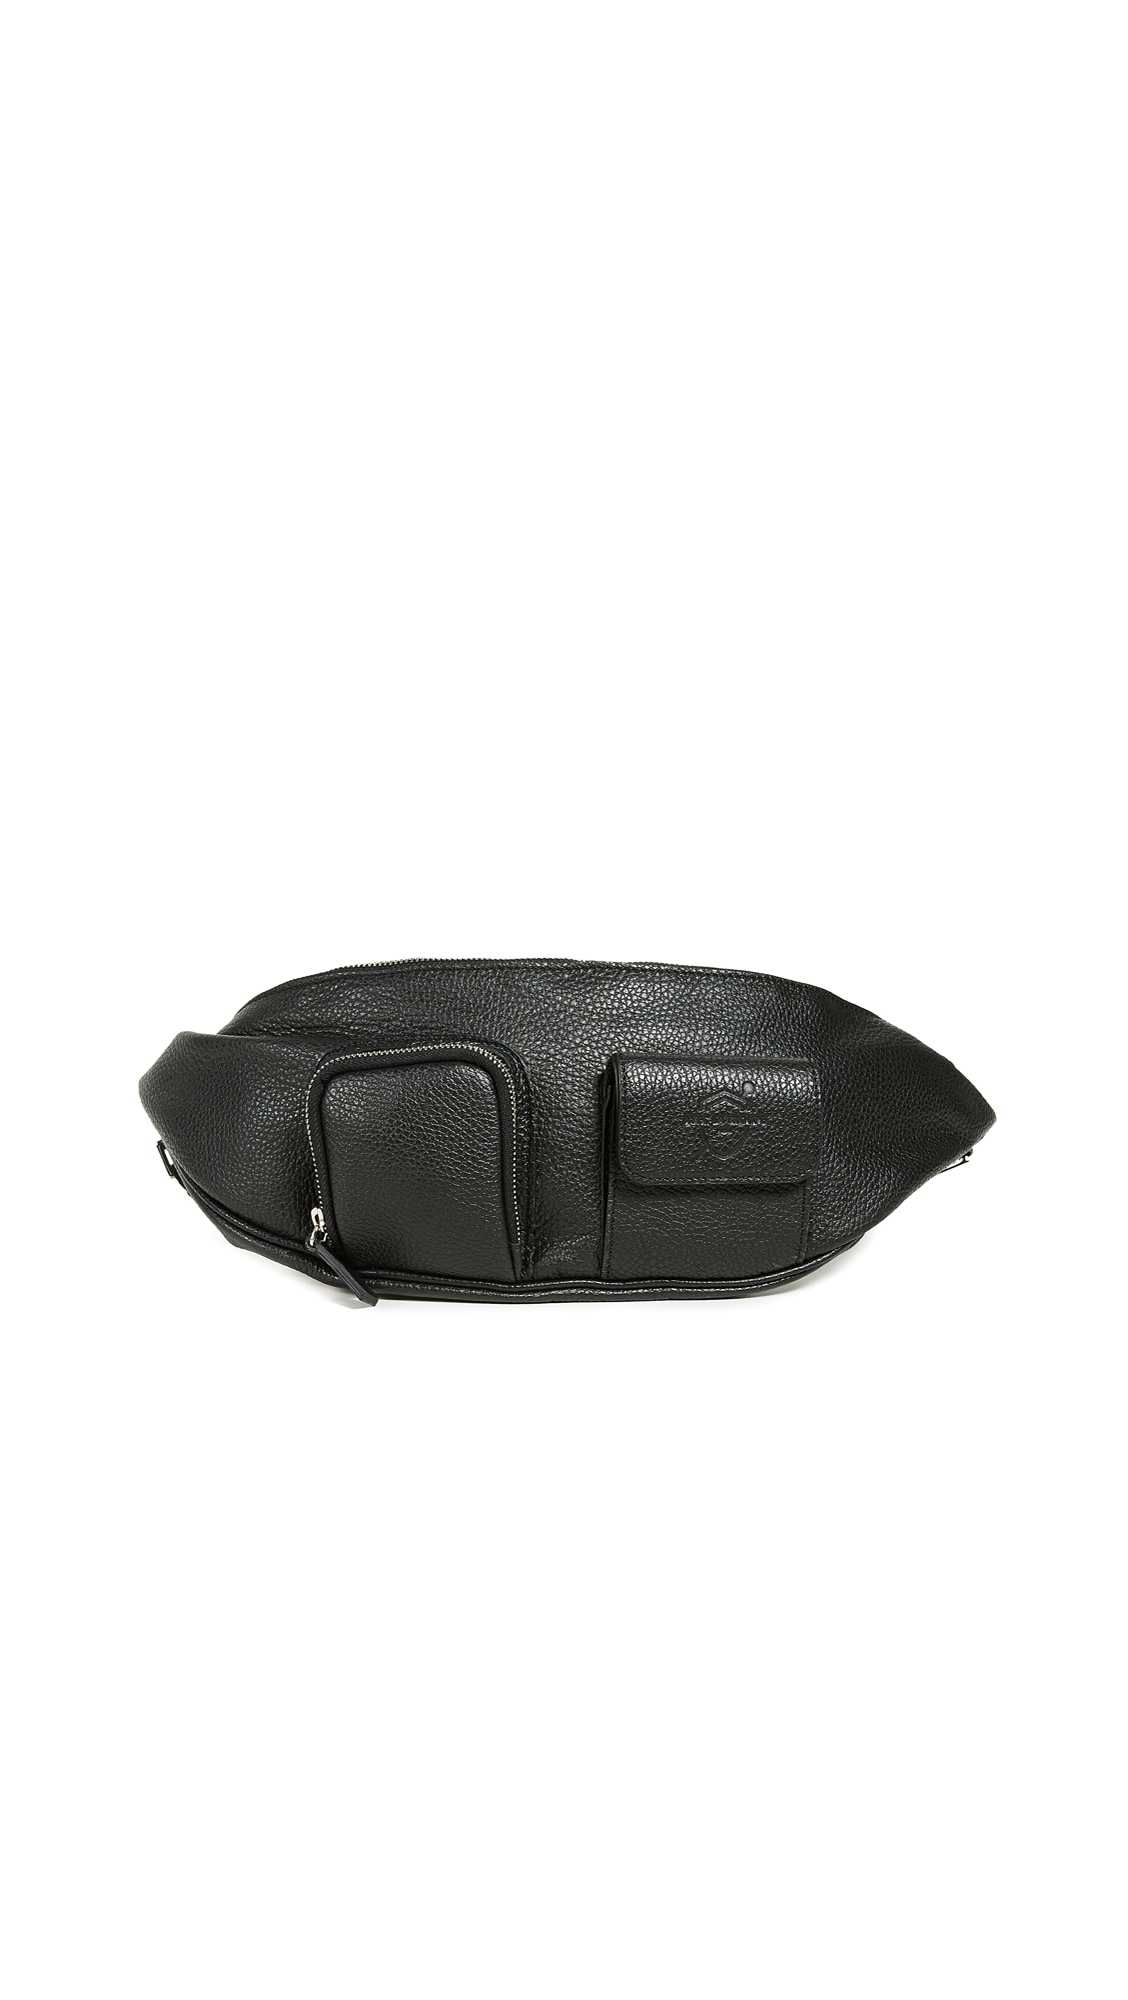 AVEC LA TROUPE Major Belt Bag in Black